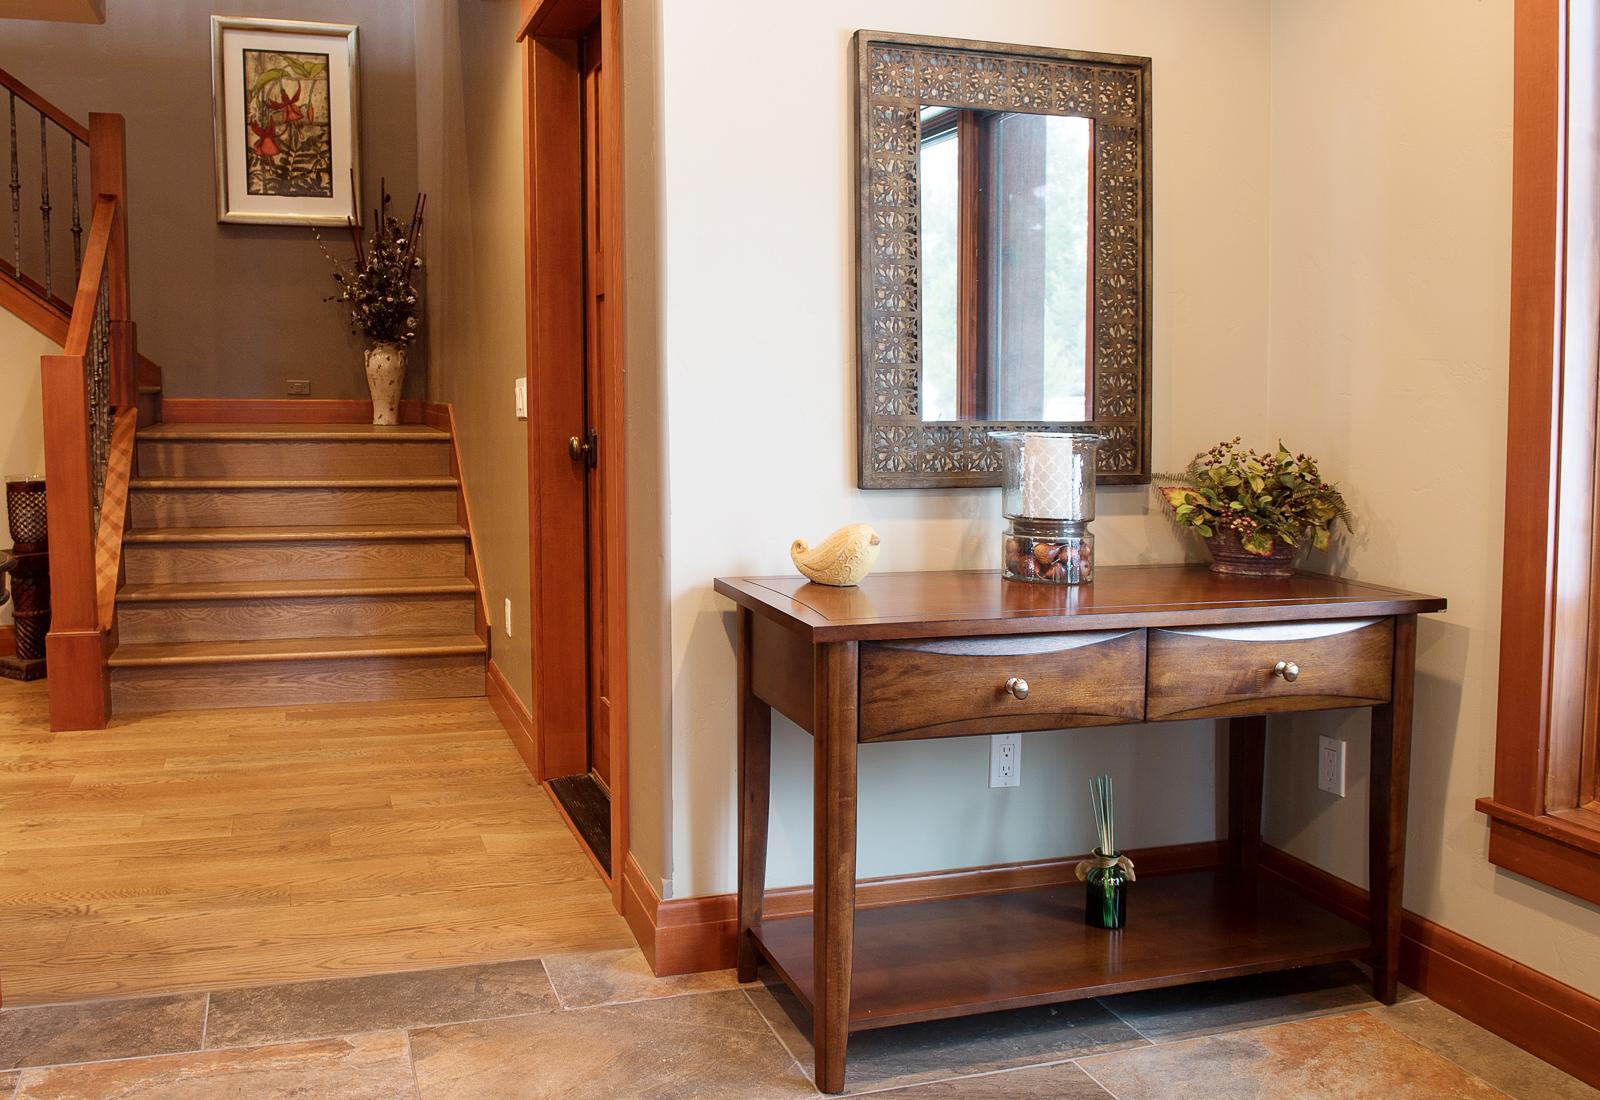 Woodworks-West-Bozeman-Montana-Builder-Cabinetry-Remodel-New-Construction-3663.jpg